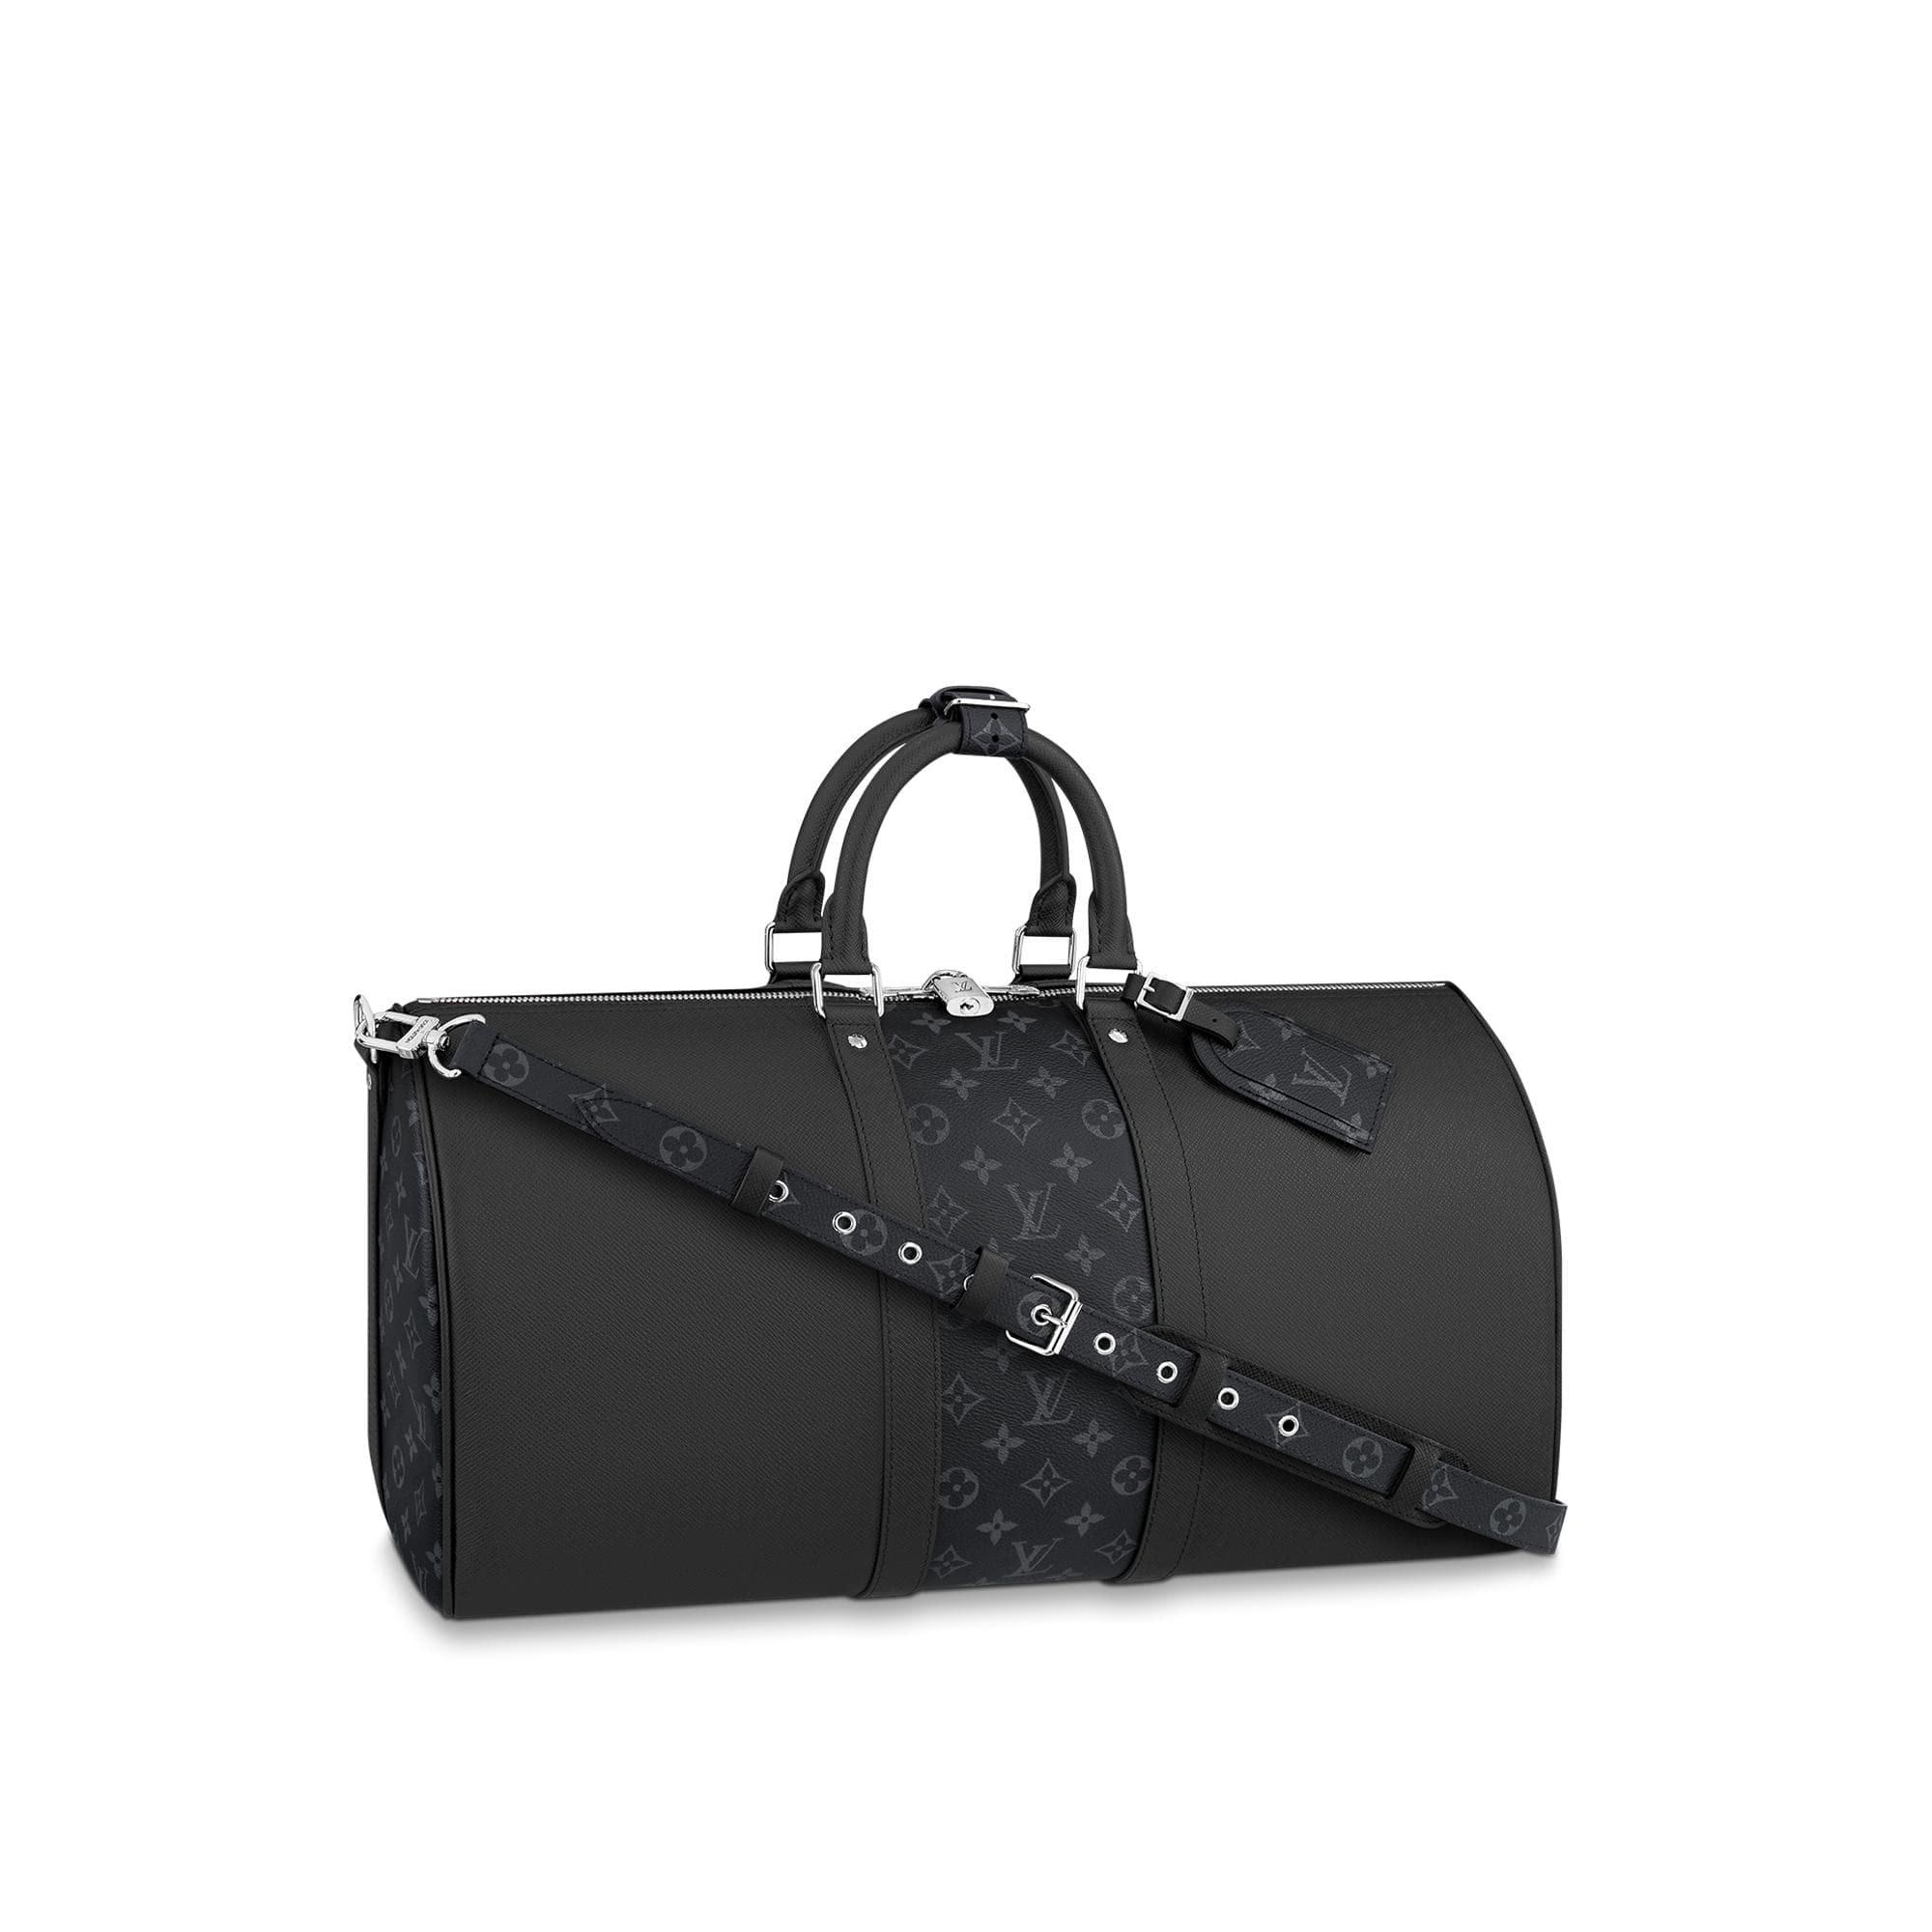 Louis Vuitton Keepall Bandouliere Monogram Eclipse 50 Black